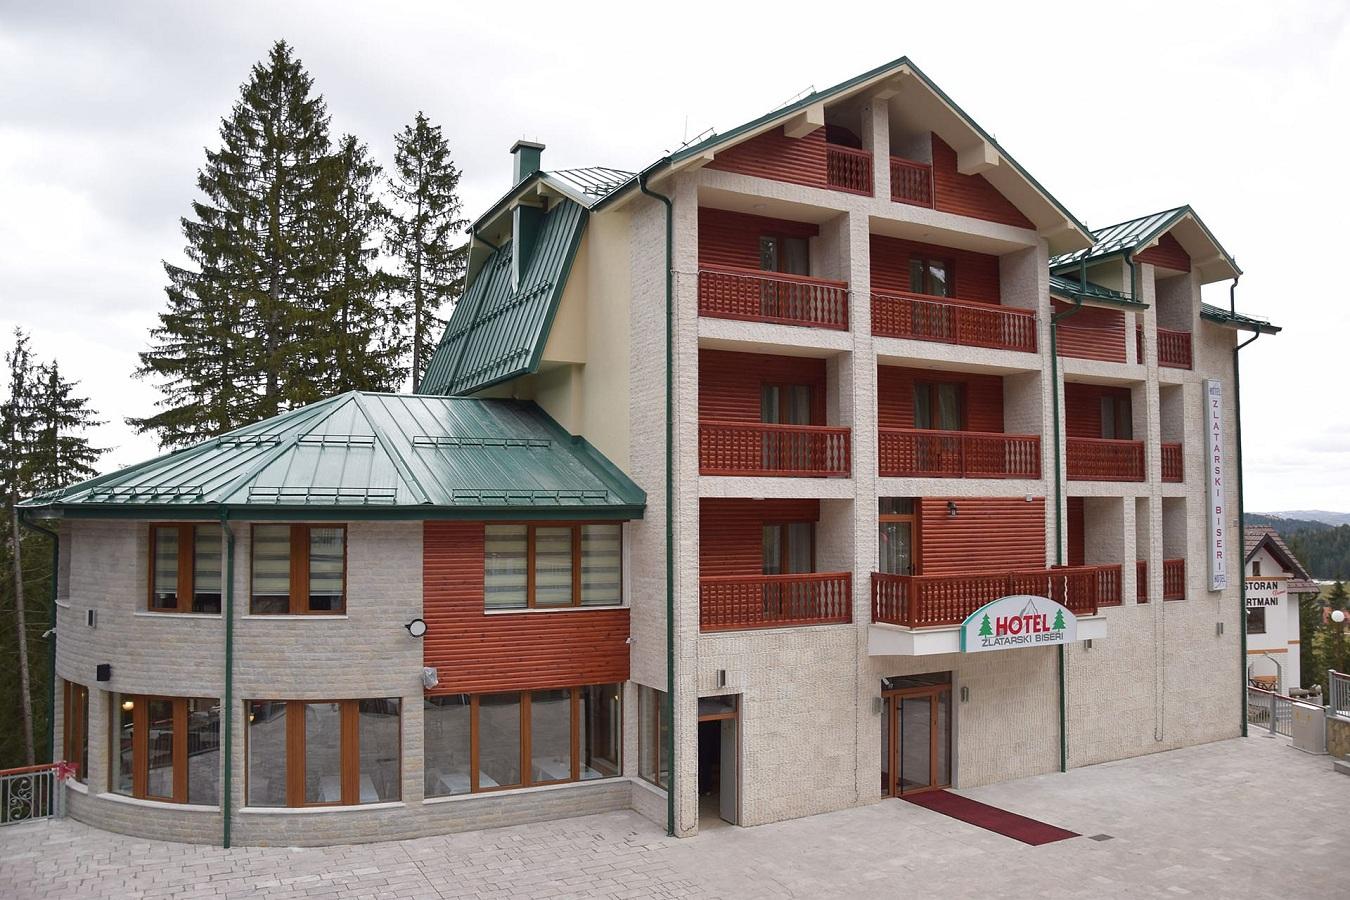 Zlatarski biseri Hotel Nova Varos Zlatar Mountain